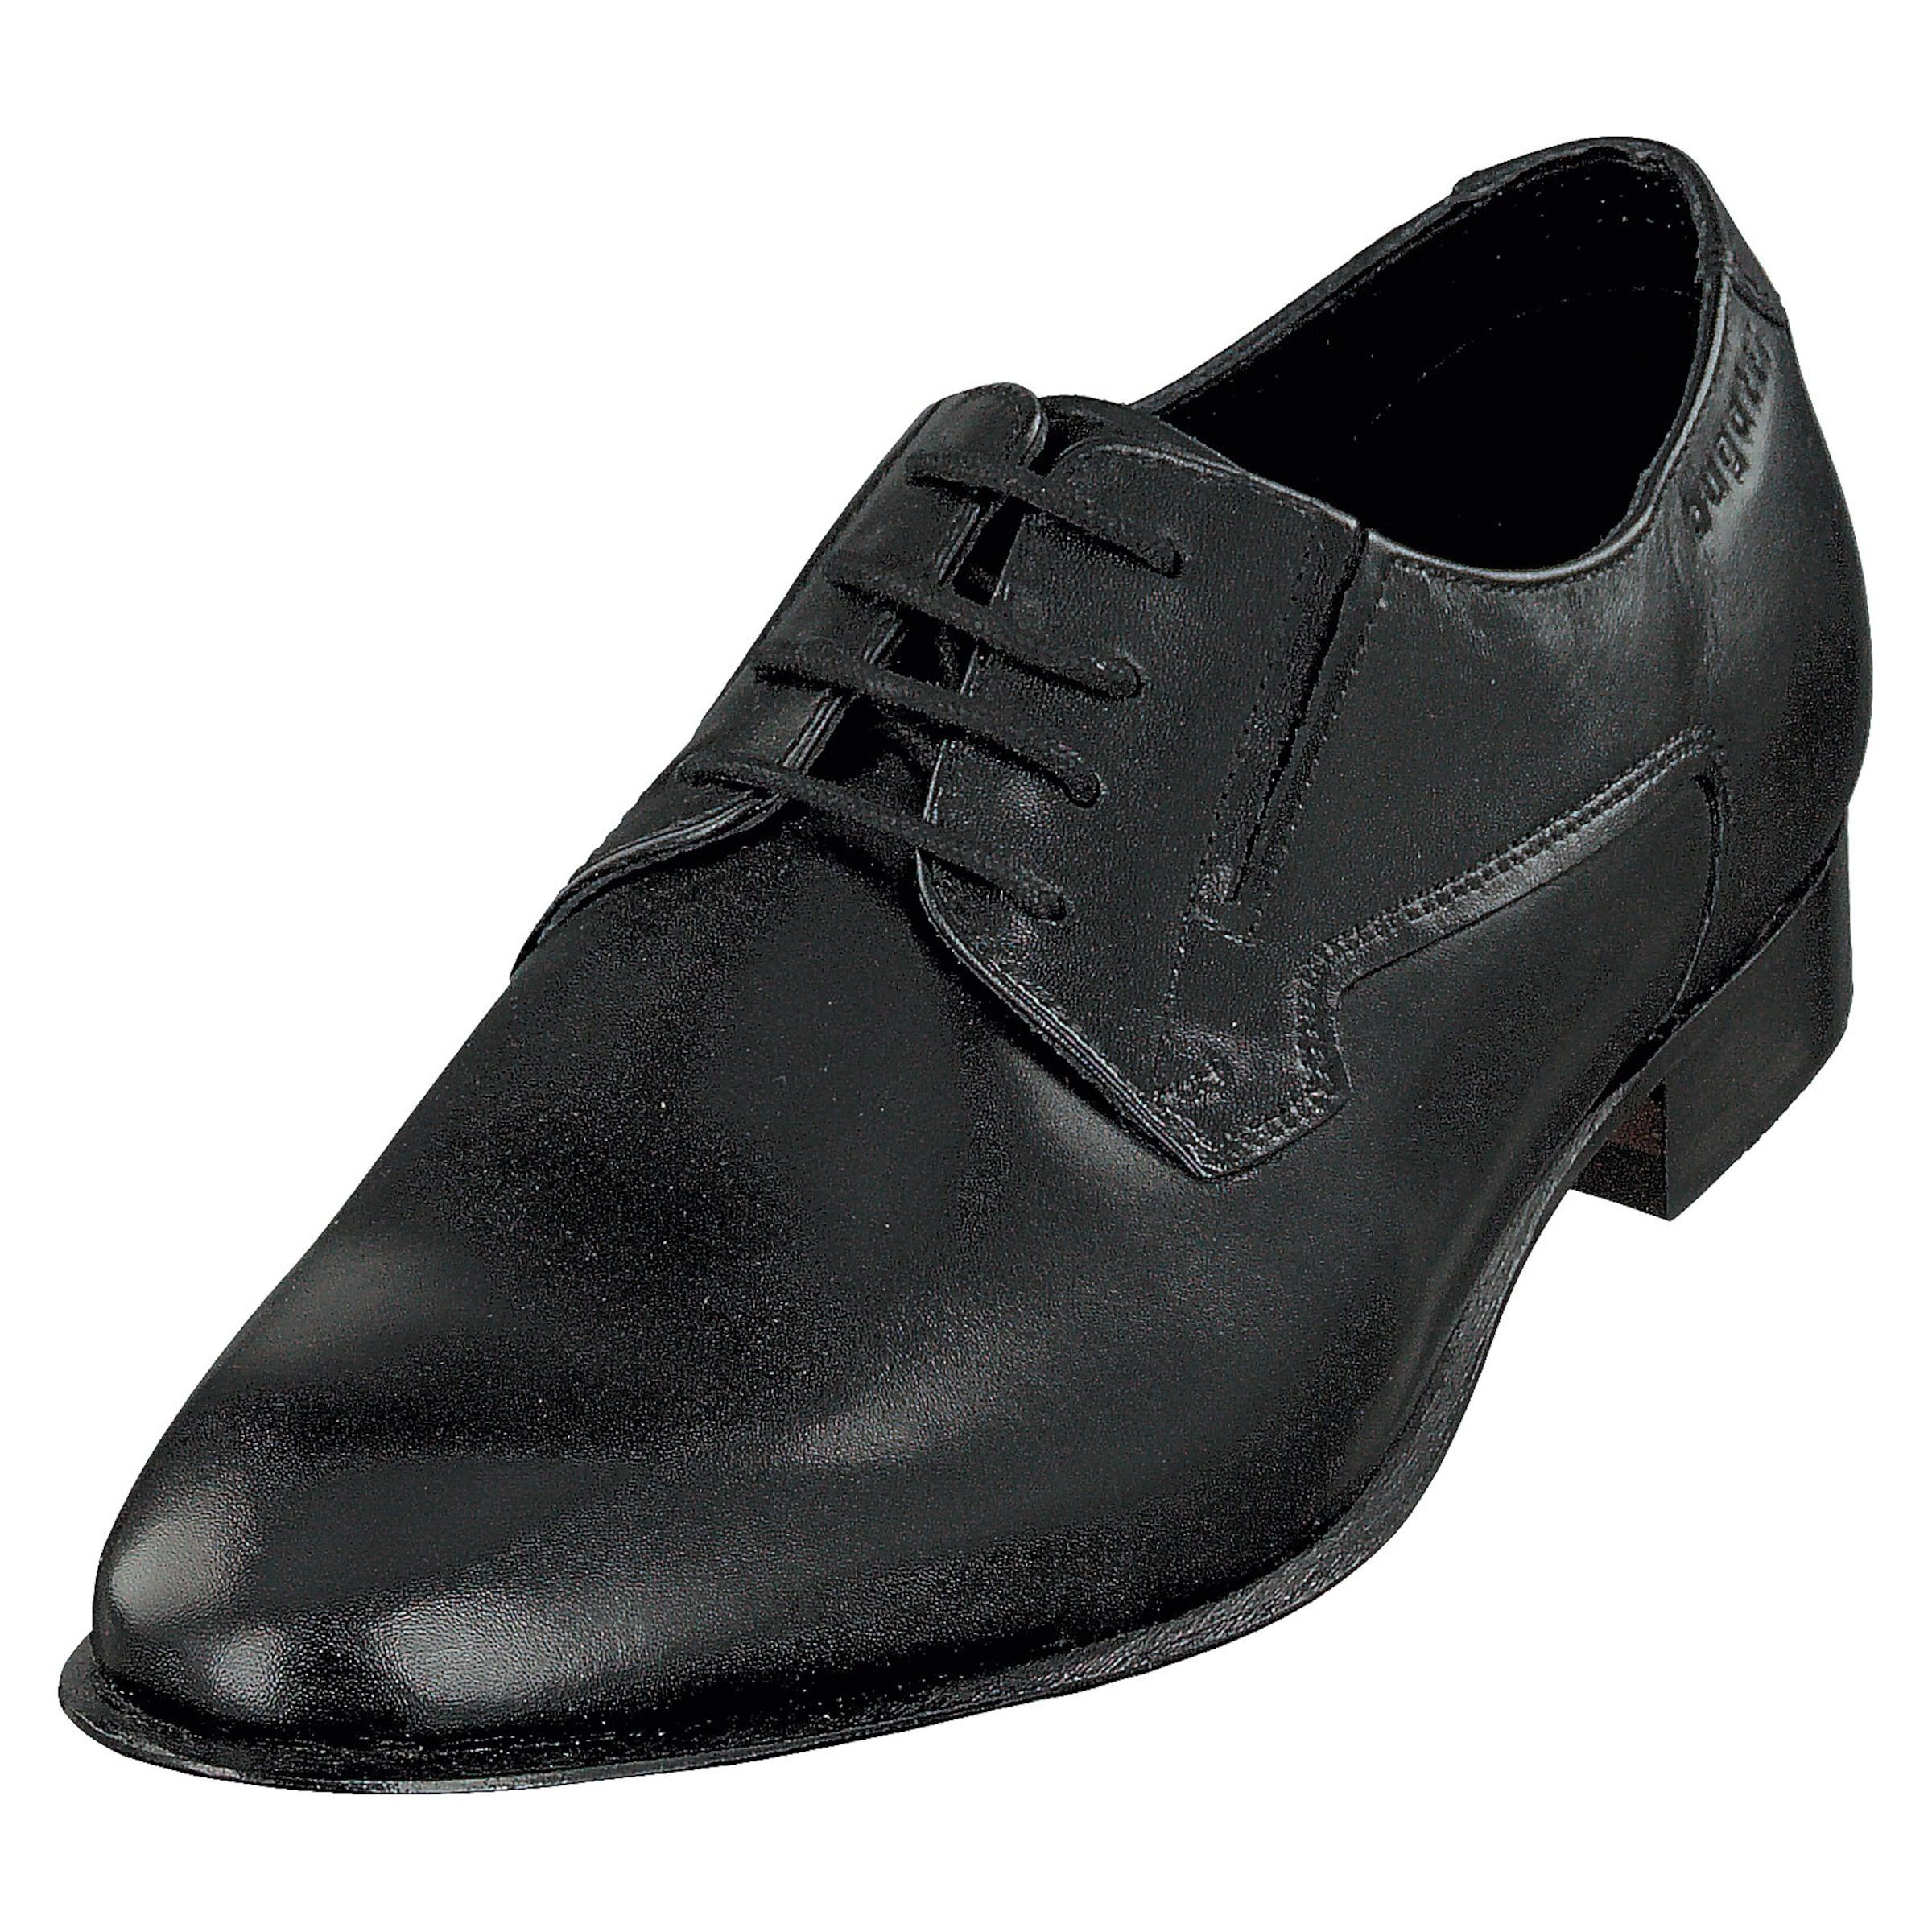 Haltbare Mode billige Schuhe bugatti   Business-Schnürschuhe Schuhe Gut Schuhe getragene Schuhe Gut ec758b